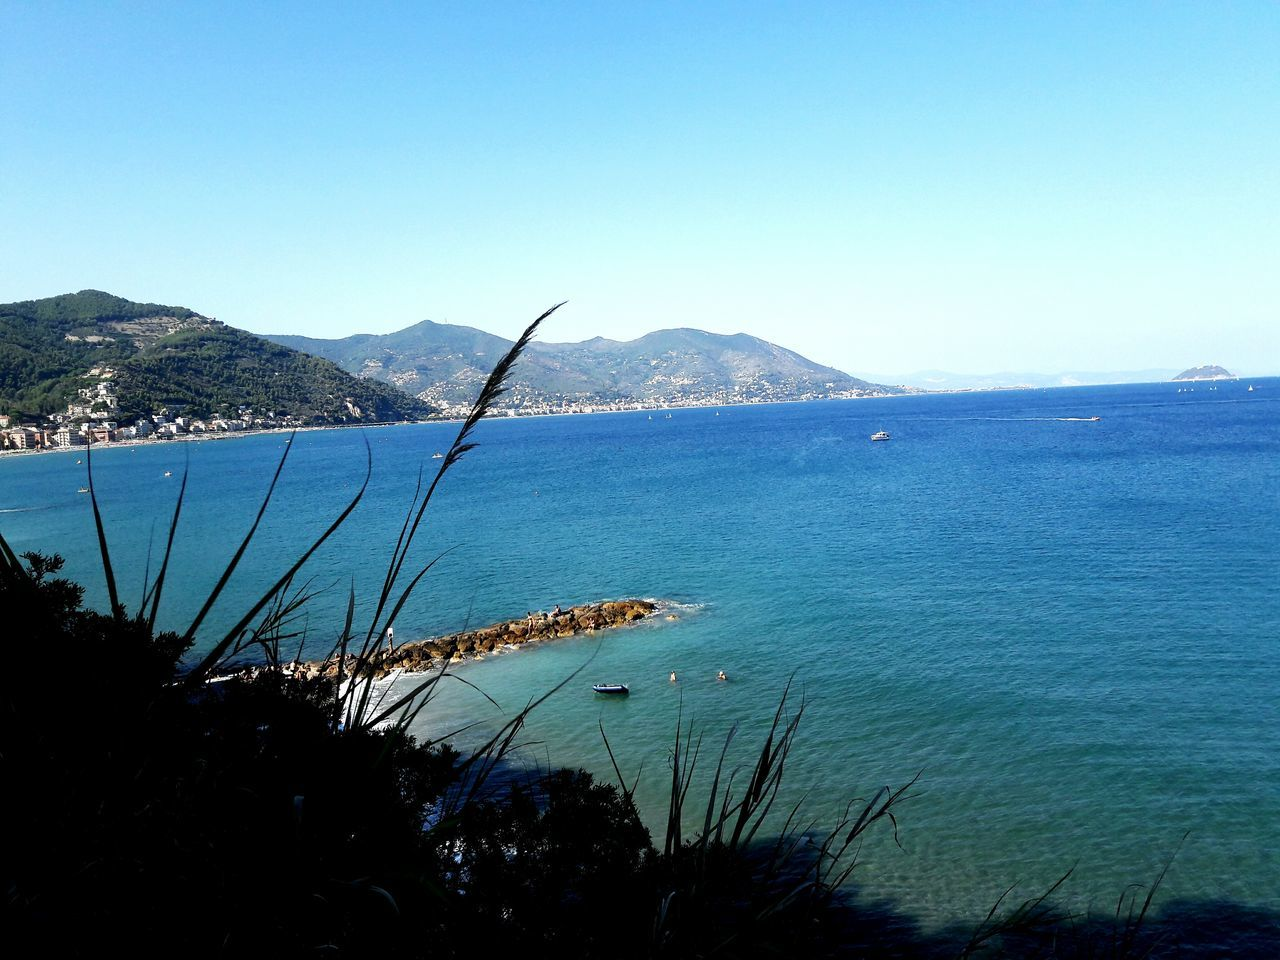 Laigueglia (IT)🏝🌊🔥 Myphoto Sea Blue Travel Sky Nature Beach Fantastic Italy Holidays Fantastic View Liguria,Italy Green Sky Landscape Summertime Summer2016 Memories World Amazing View Beautiful Photo EyeEm Best Shots Flying High